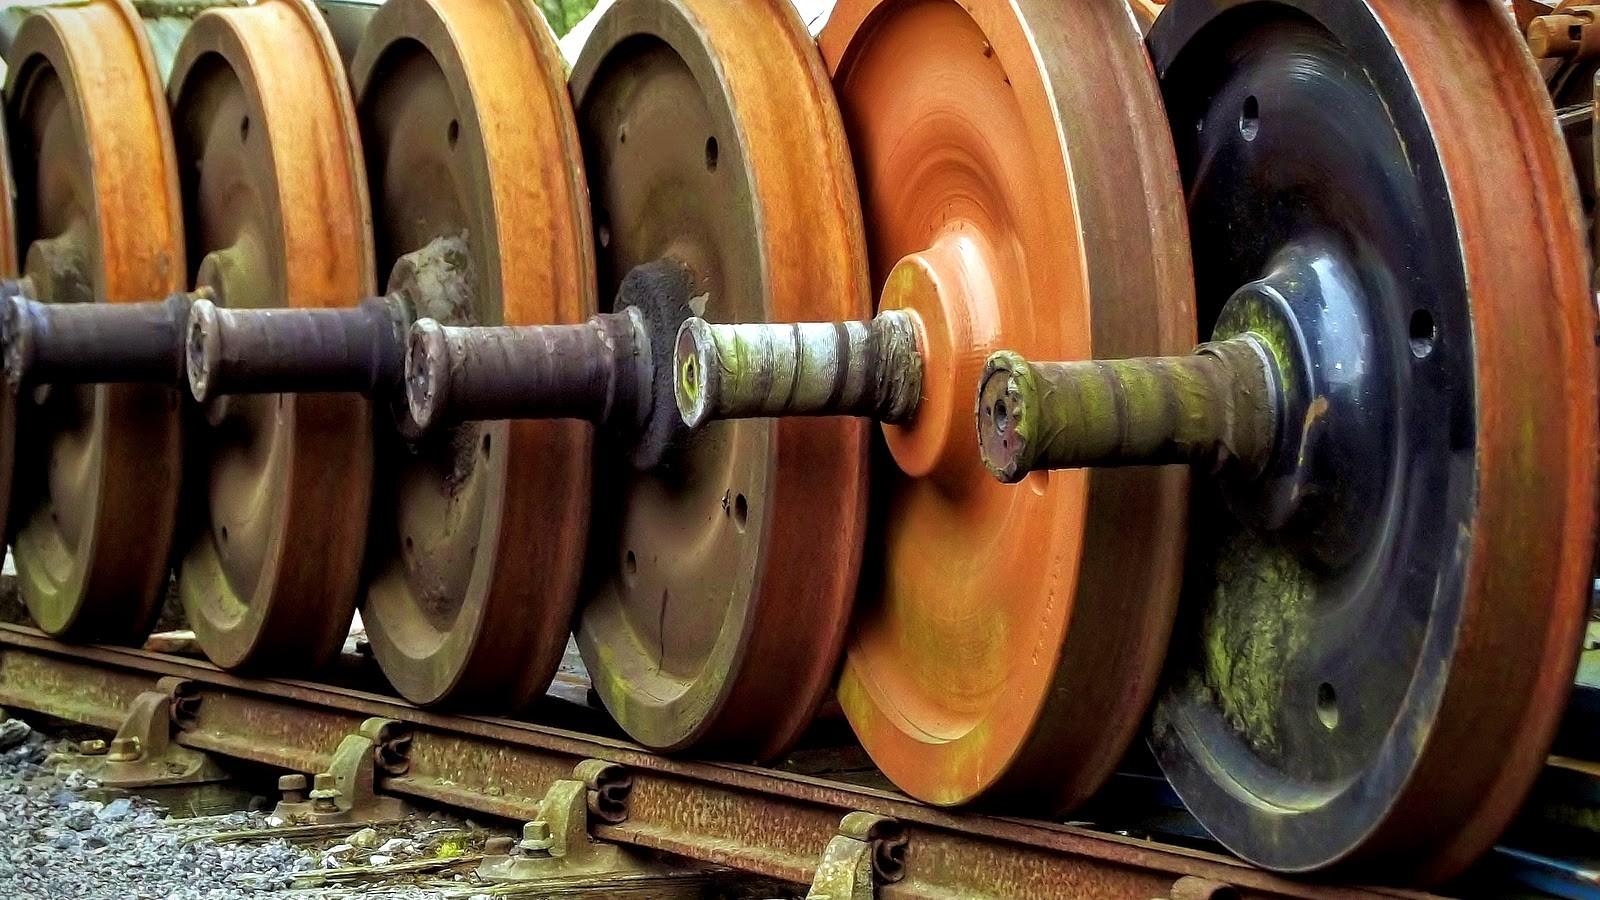 Steel railway wheels within wheels / Flickr / Thomas's Pics / EPNA, Brussels / CC BY 2.0